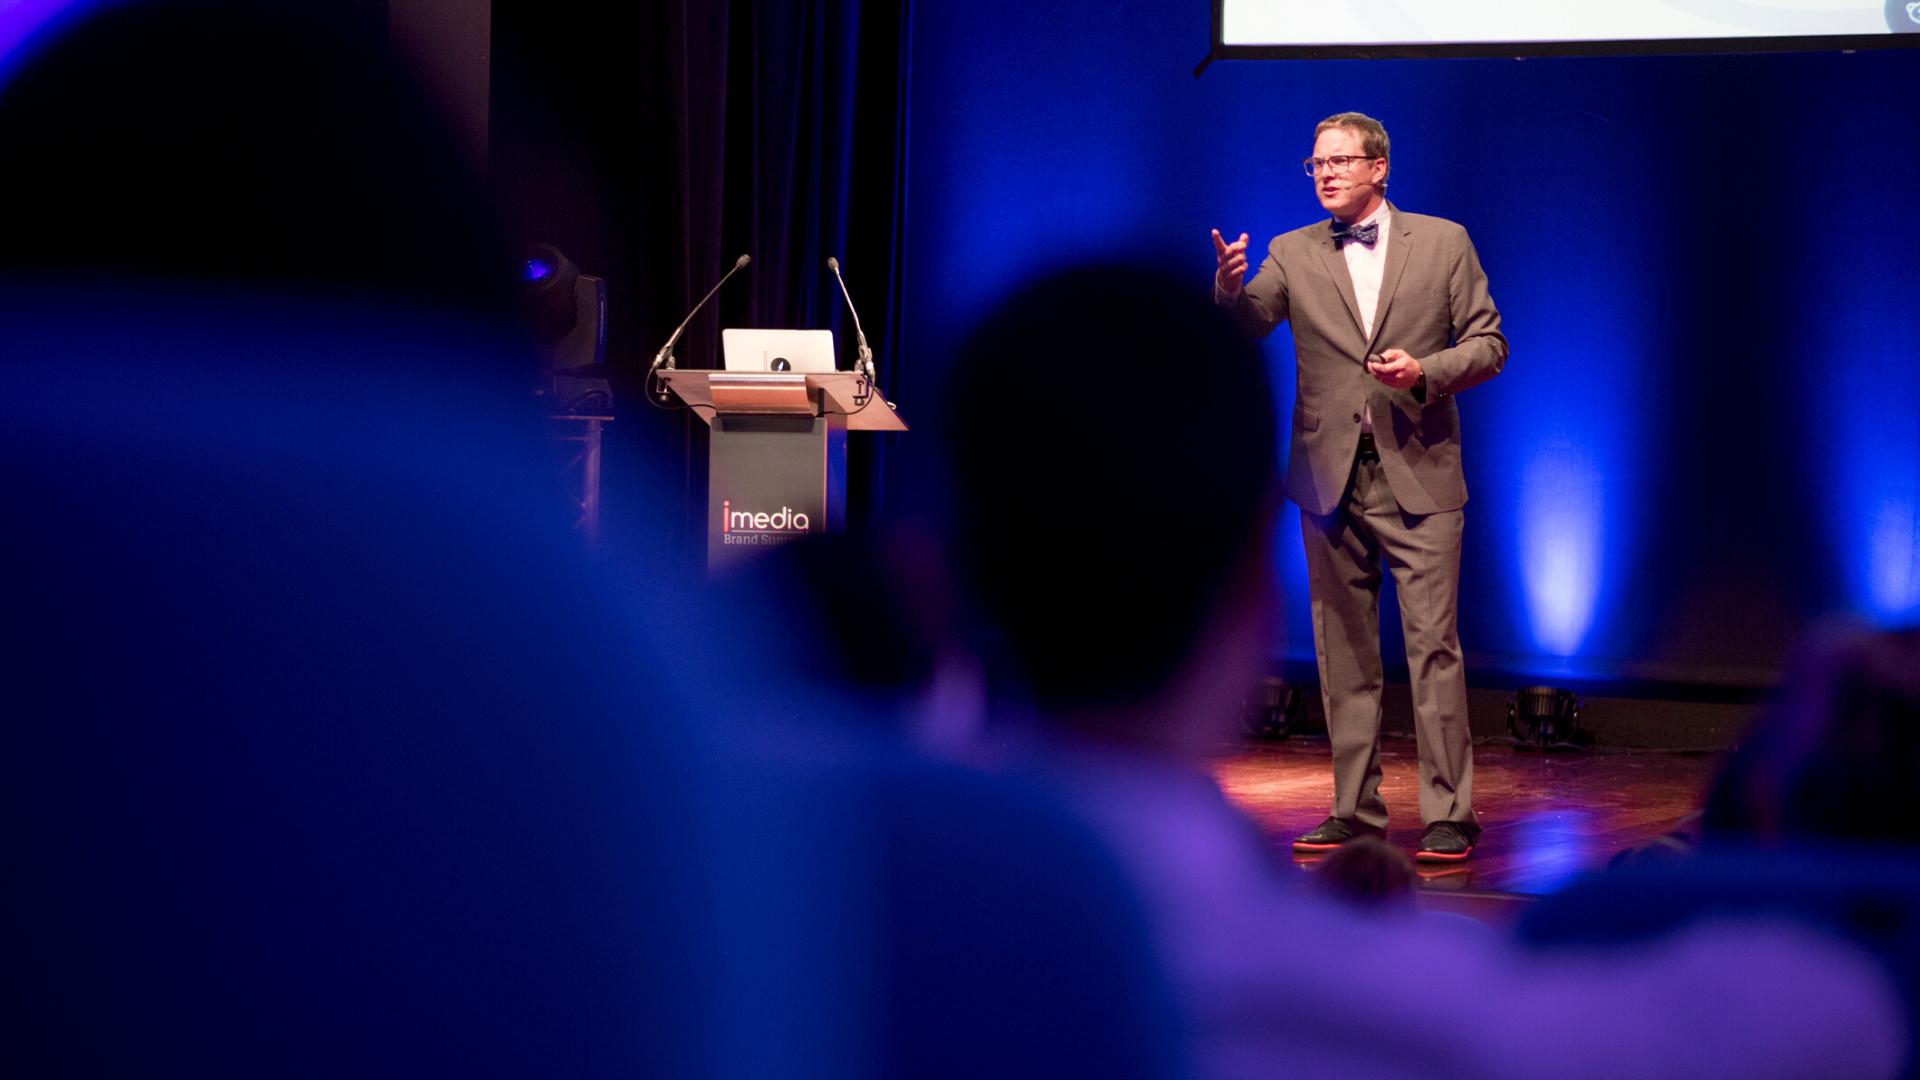 Andrew Davis, imedia brand summit event